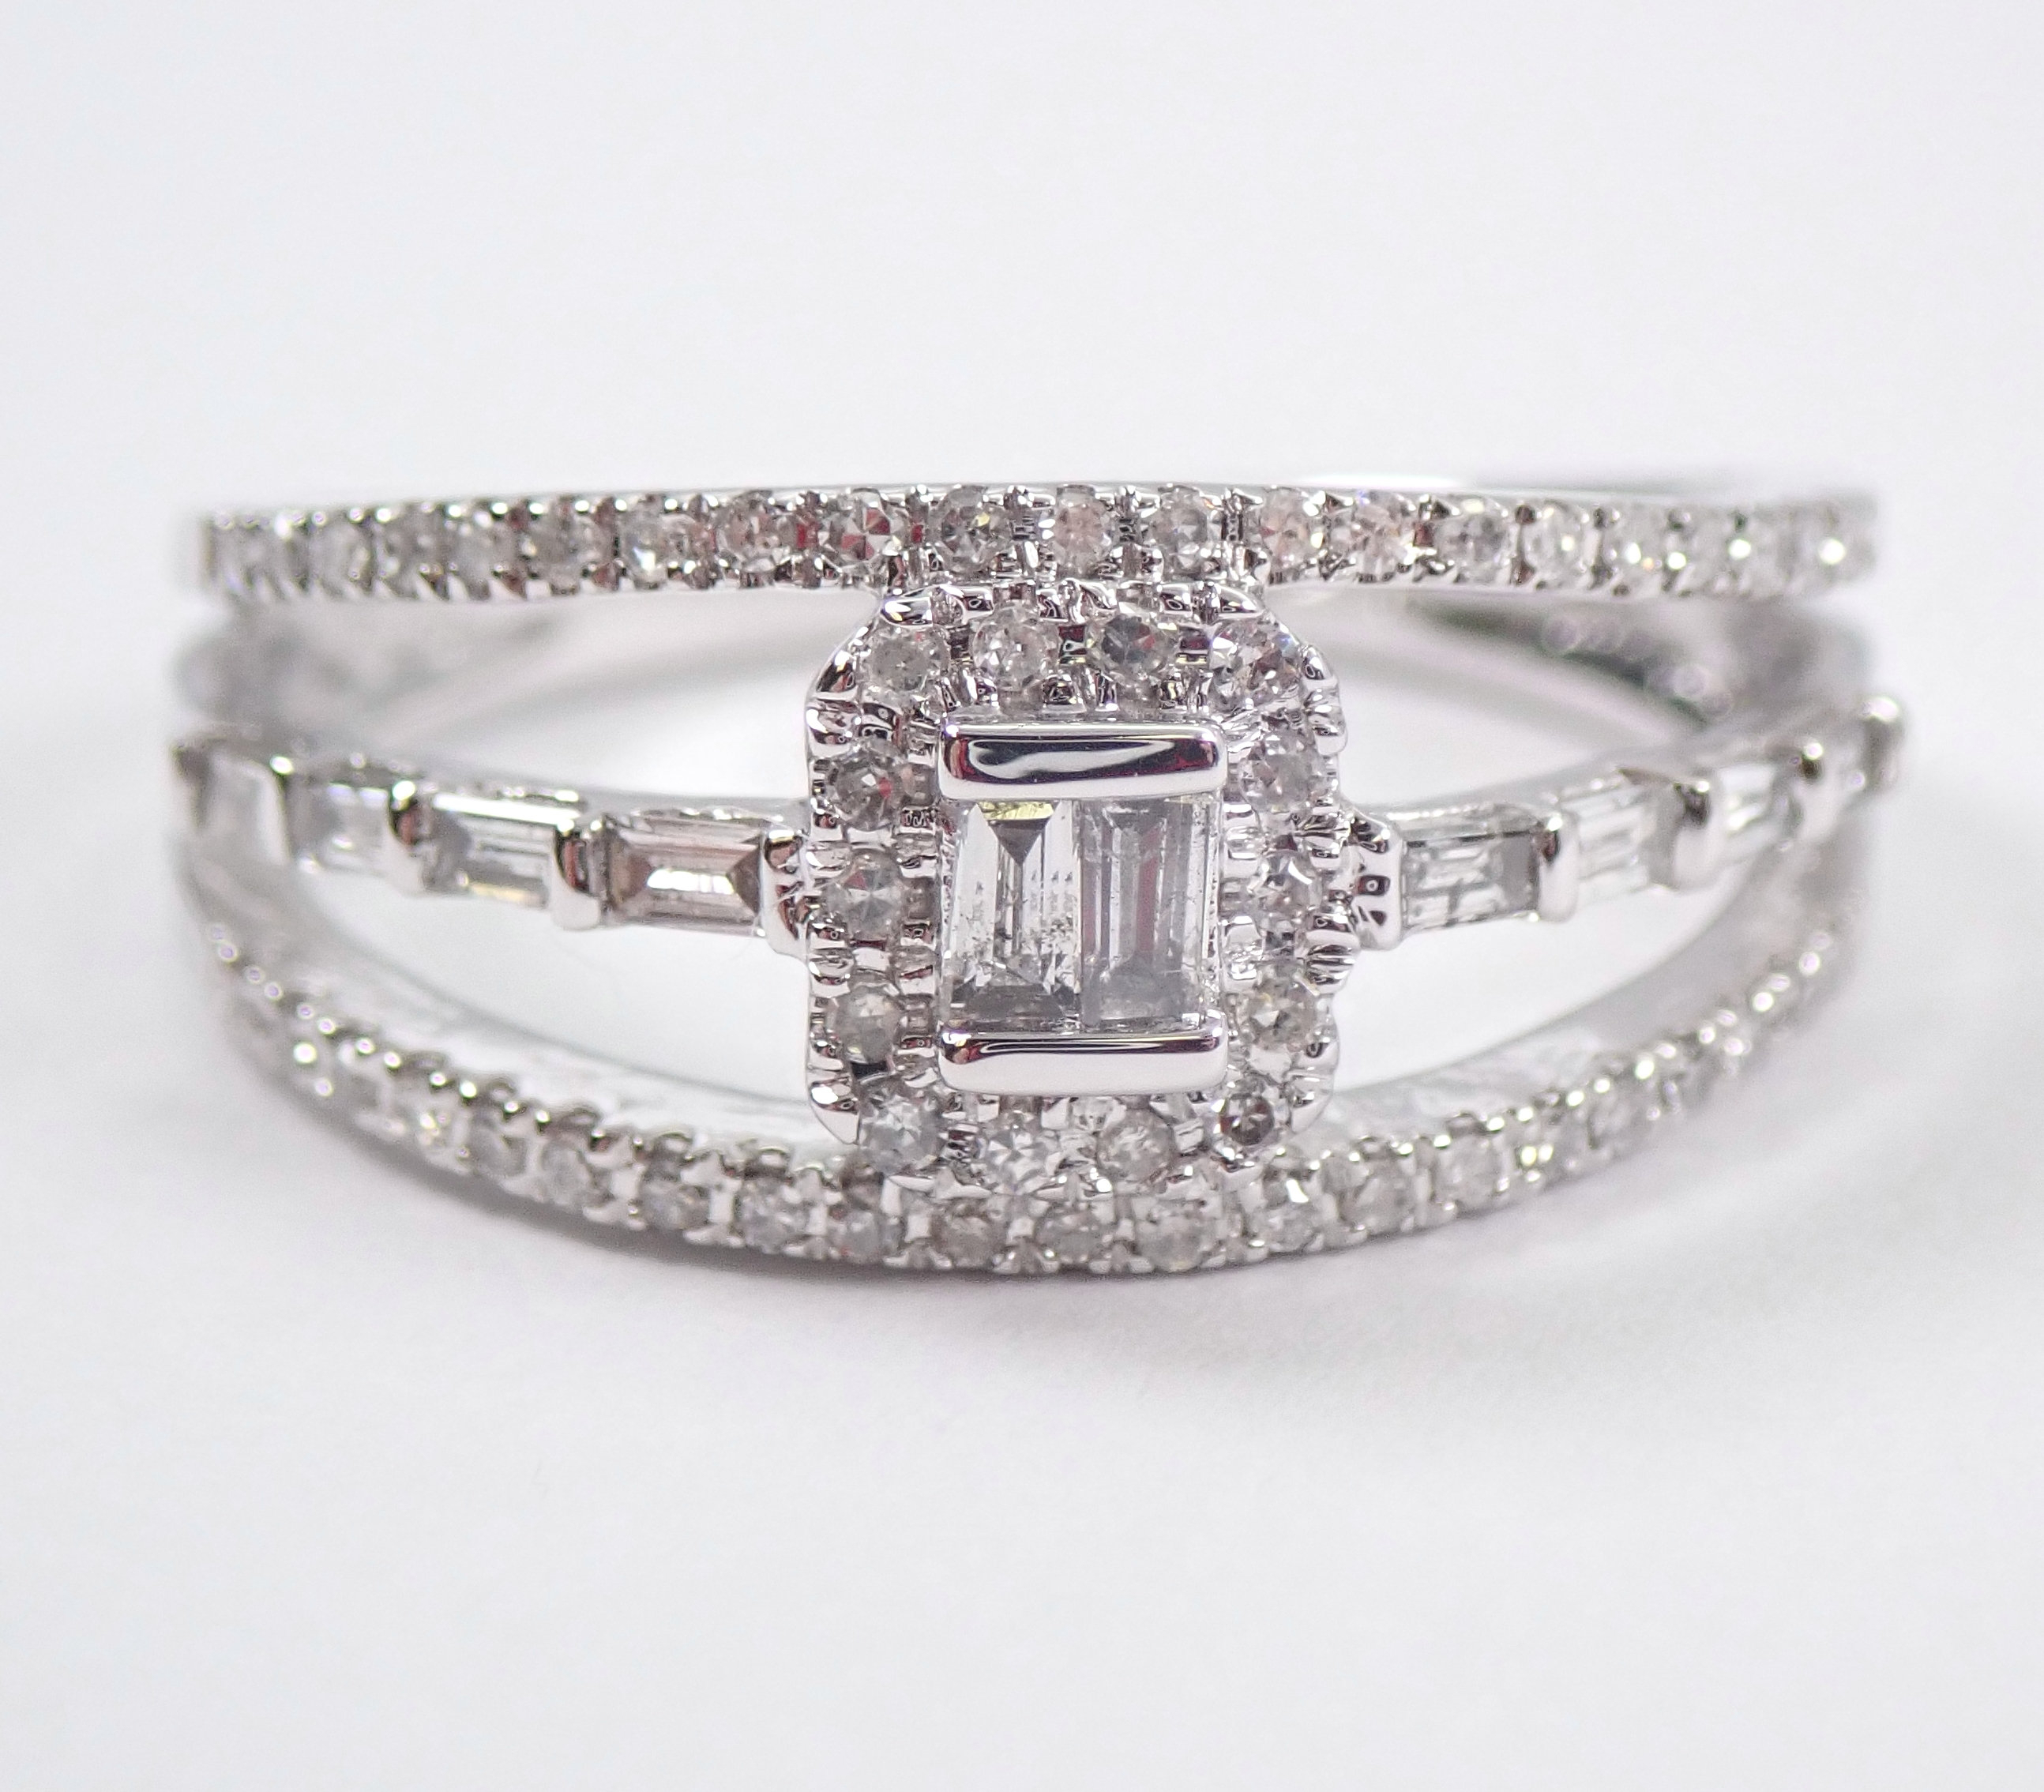 14k White Gold Diamond Engagement Ring Multi Row Anniversary Band Size 7 Regarding Newest Diamond Seven Row Anniversary Rings In White Gold (View 12 of 25)